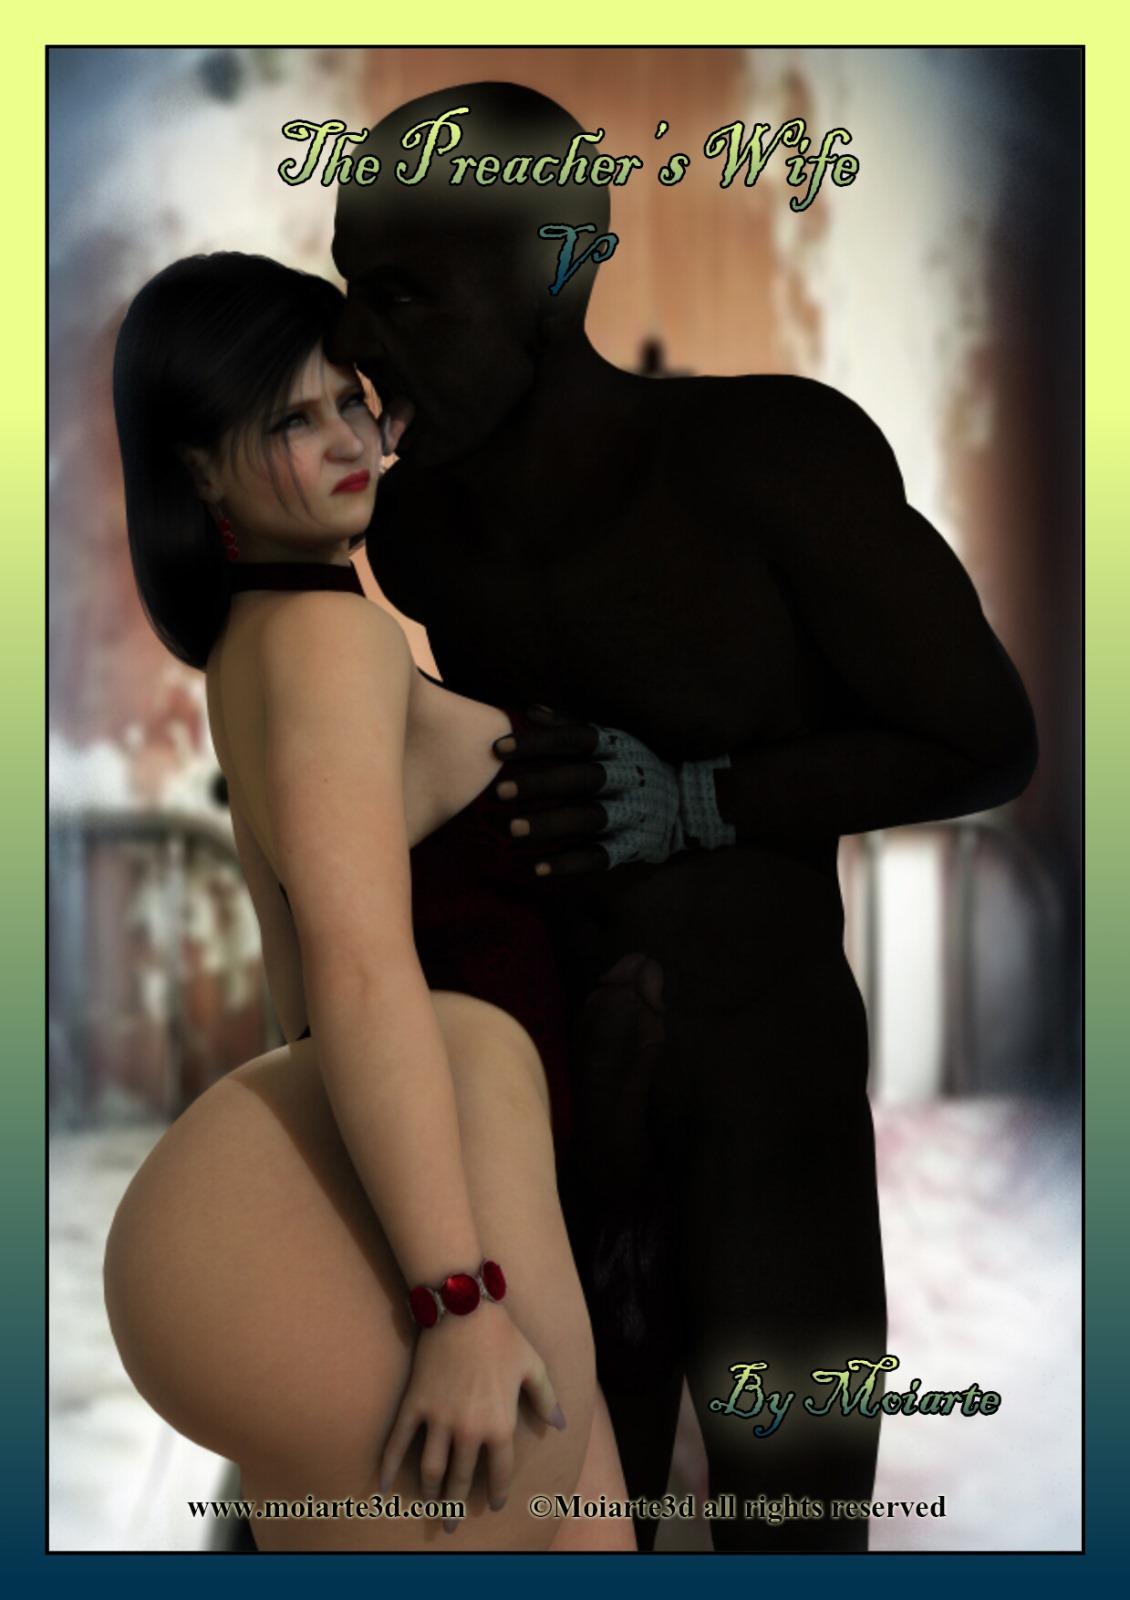 The Preacher's Wife 5- Moiarte image 1